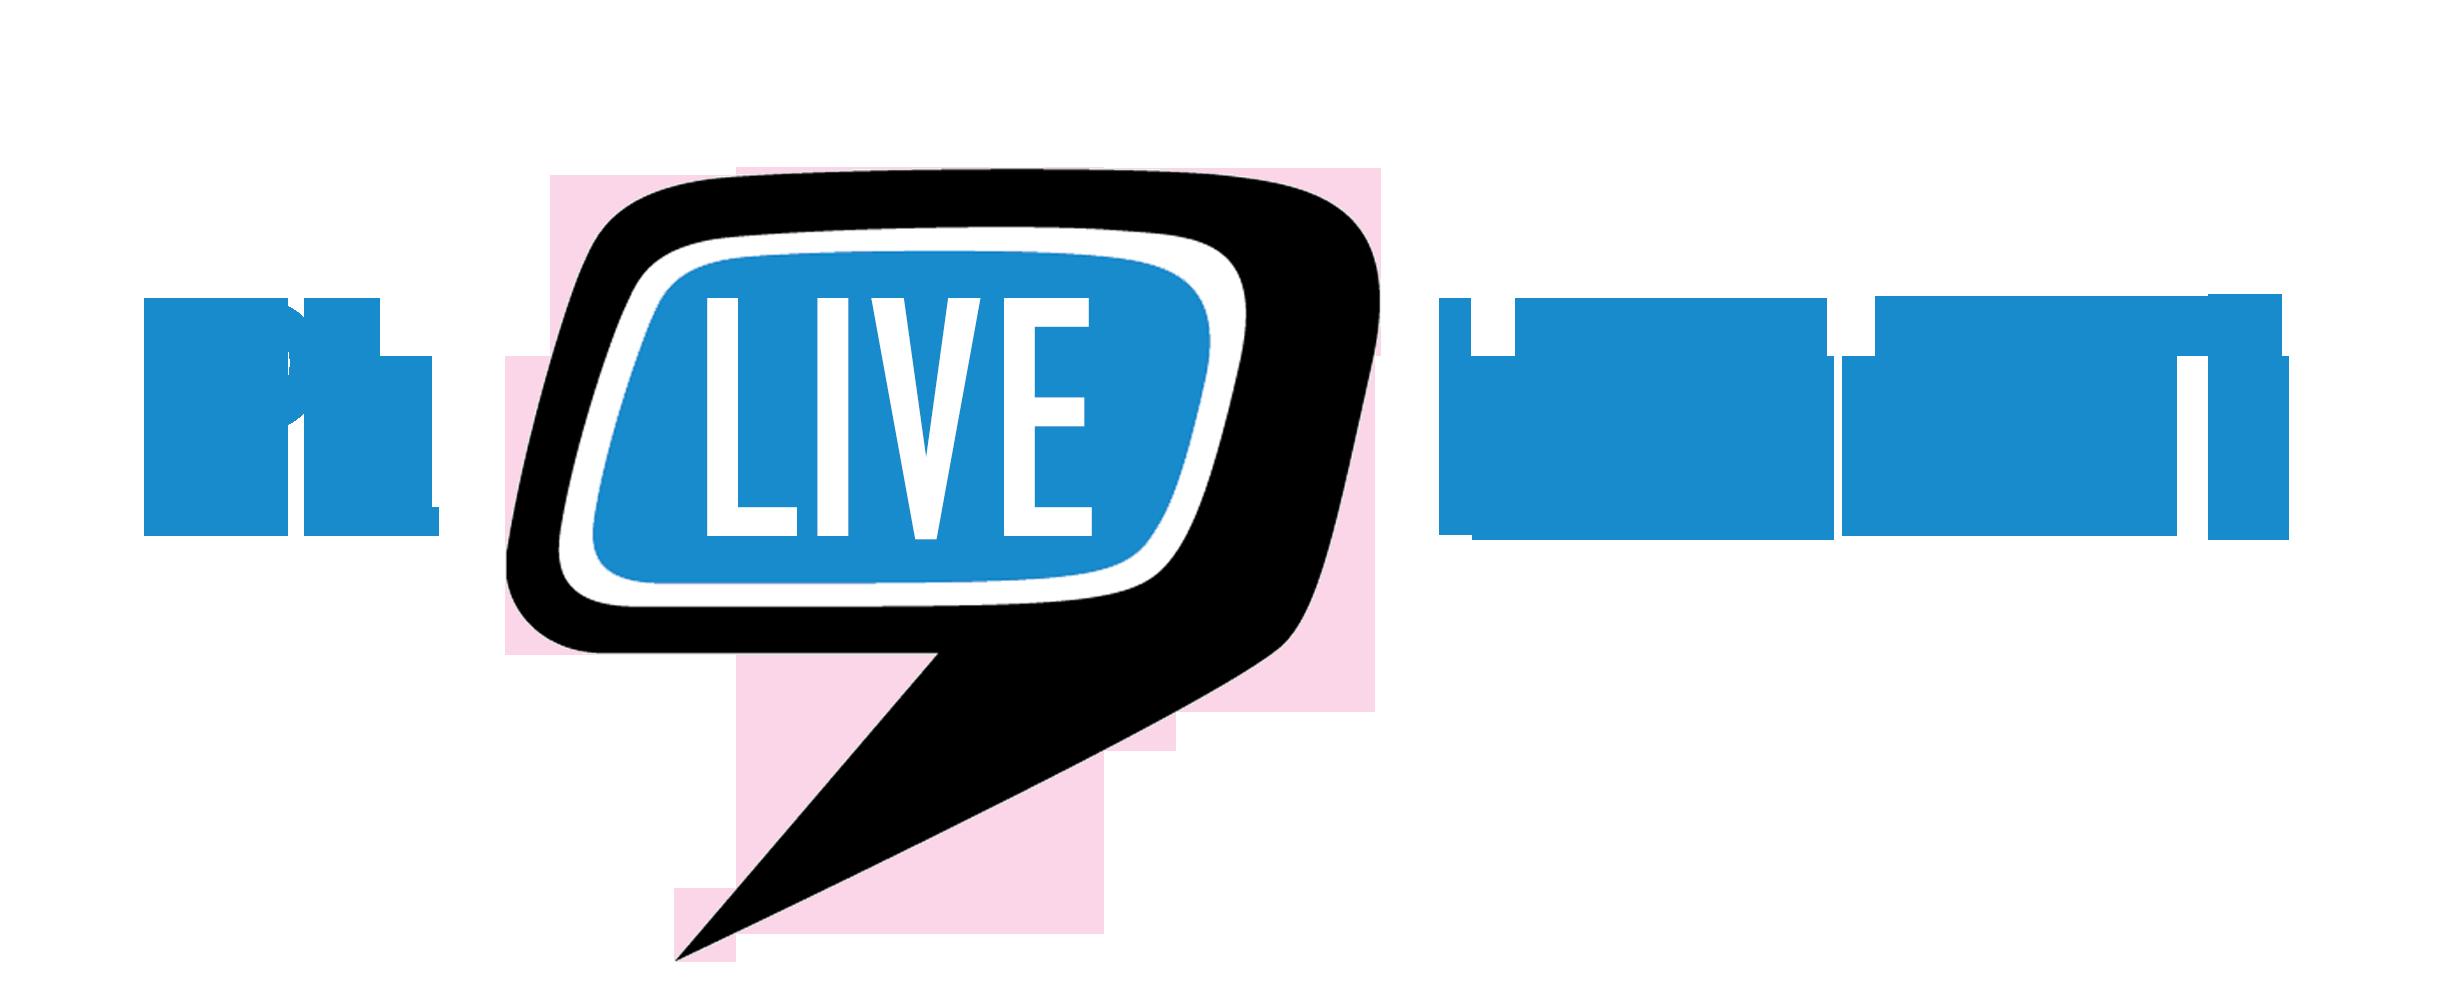 IPL Live Update 2019